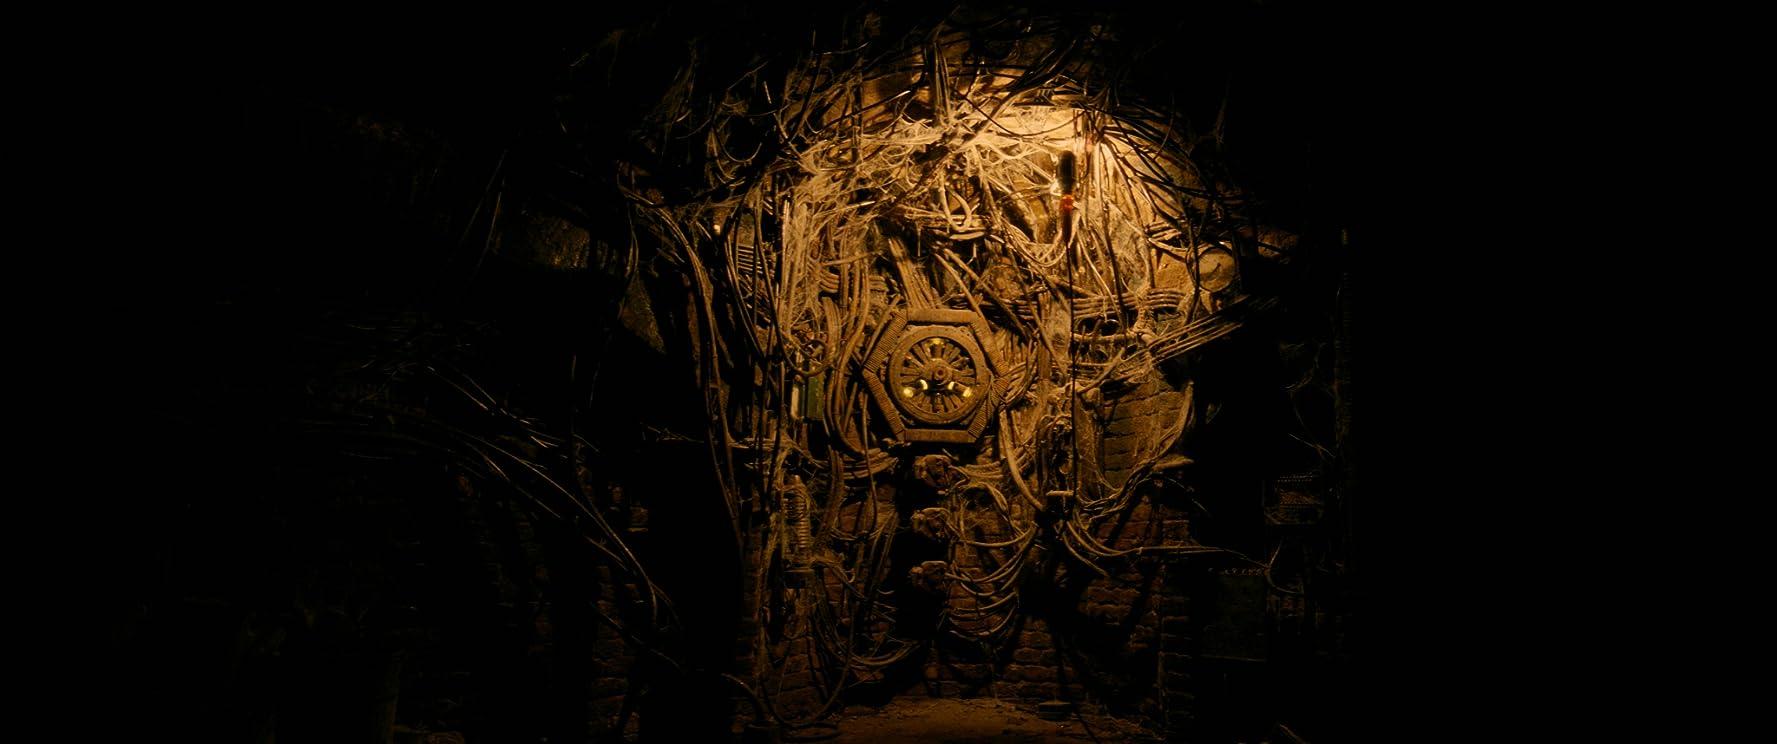 Ruangan tersembunyi yang dapat mengabulkan apapun keinginan, ternyata menyimpan sejumlah misteri